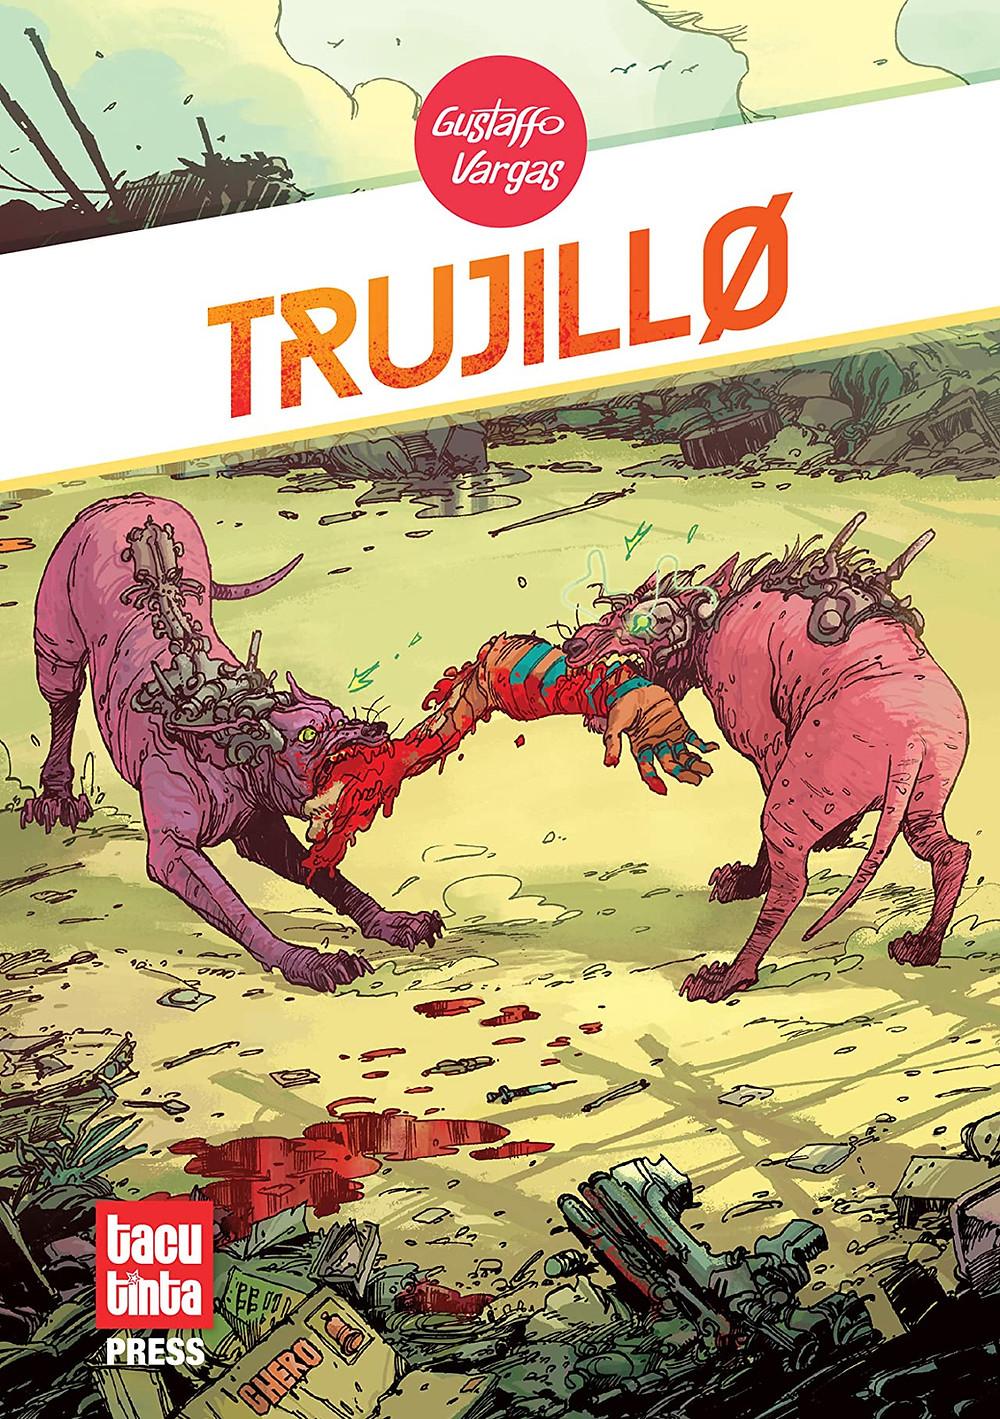 Trujillo, Cover, Tacu Tinta Press, Gustaffo Vargas